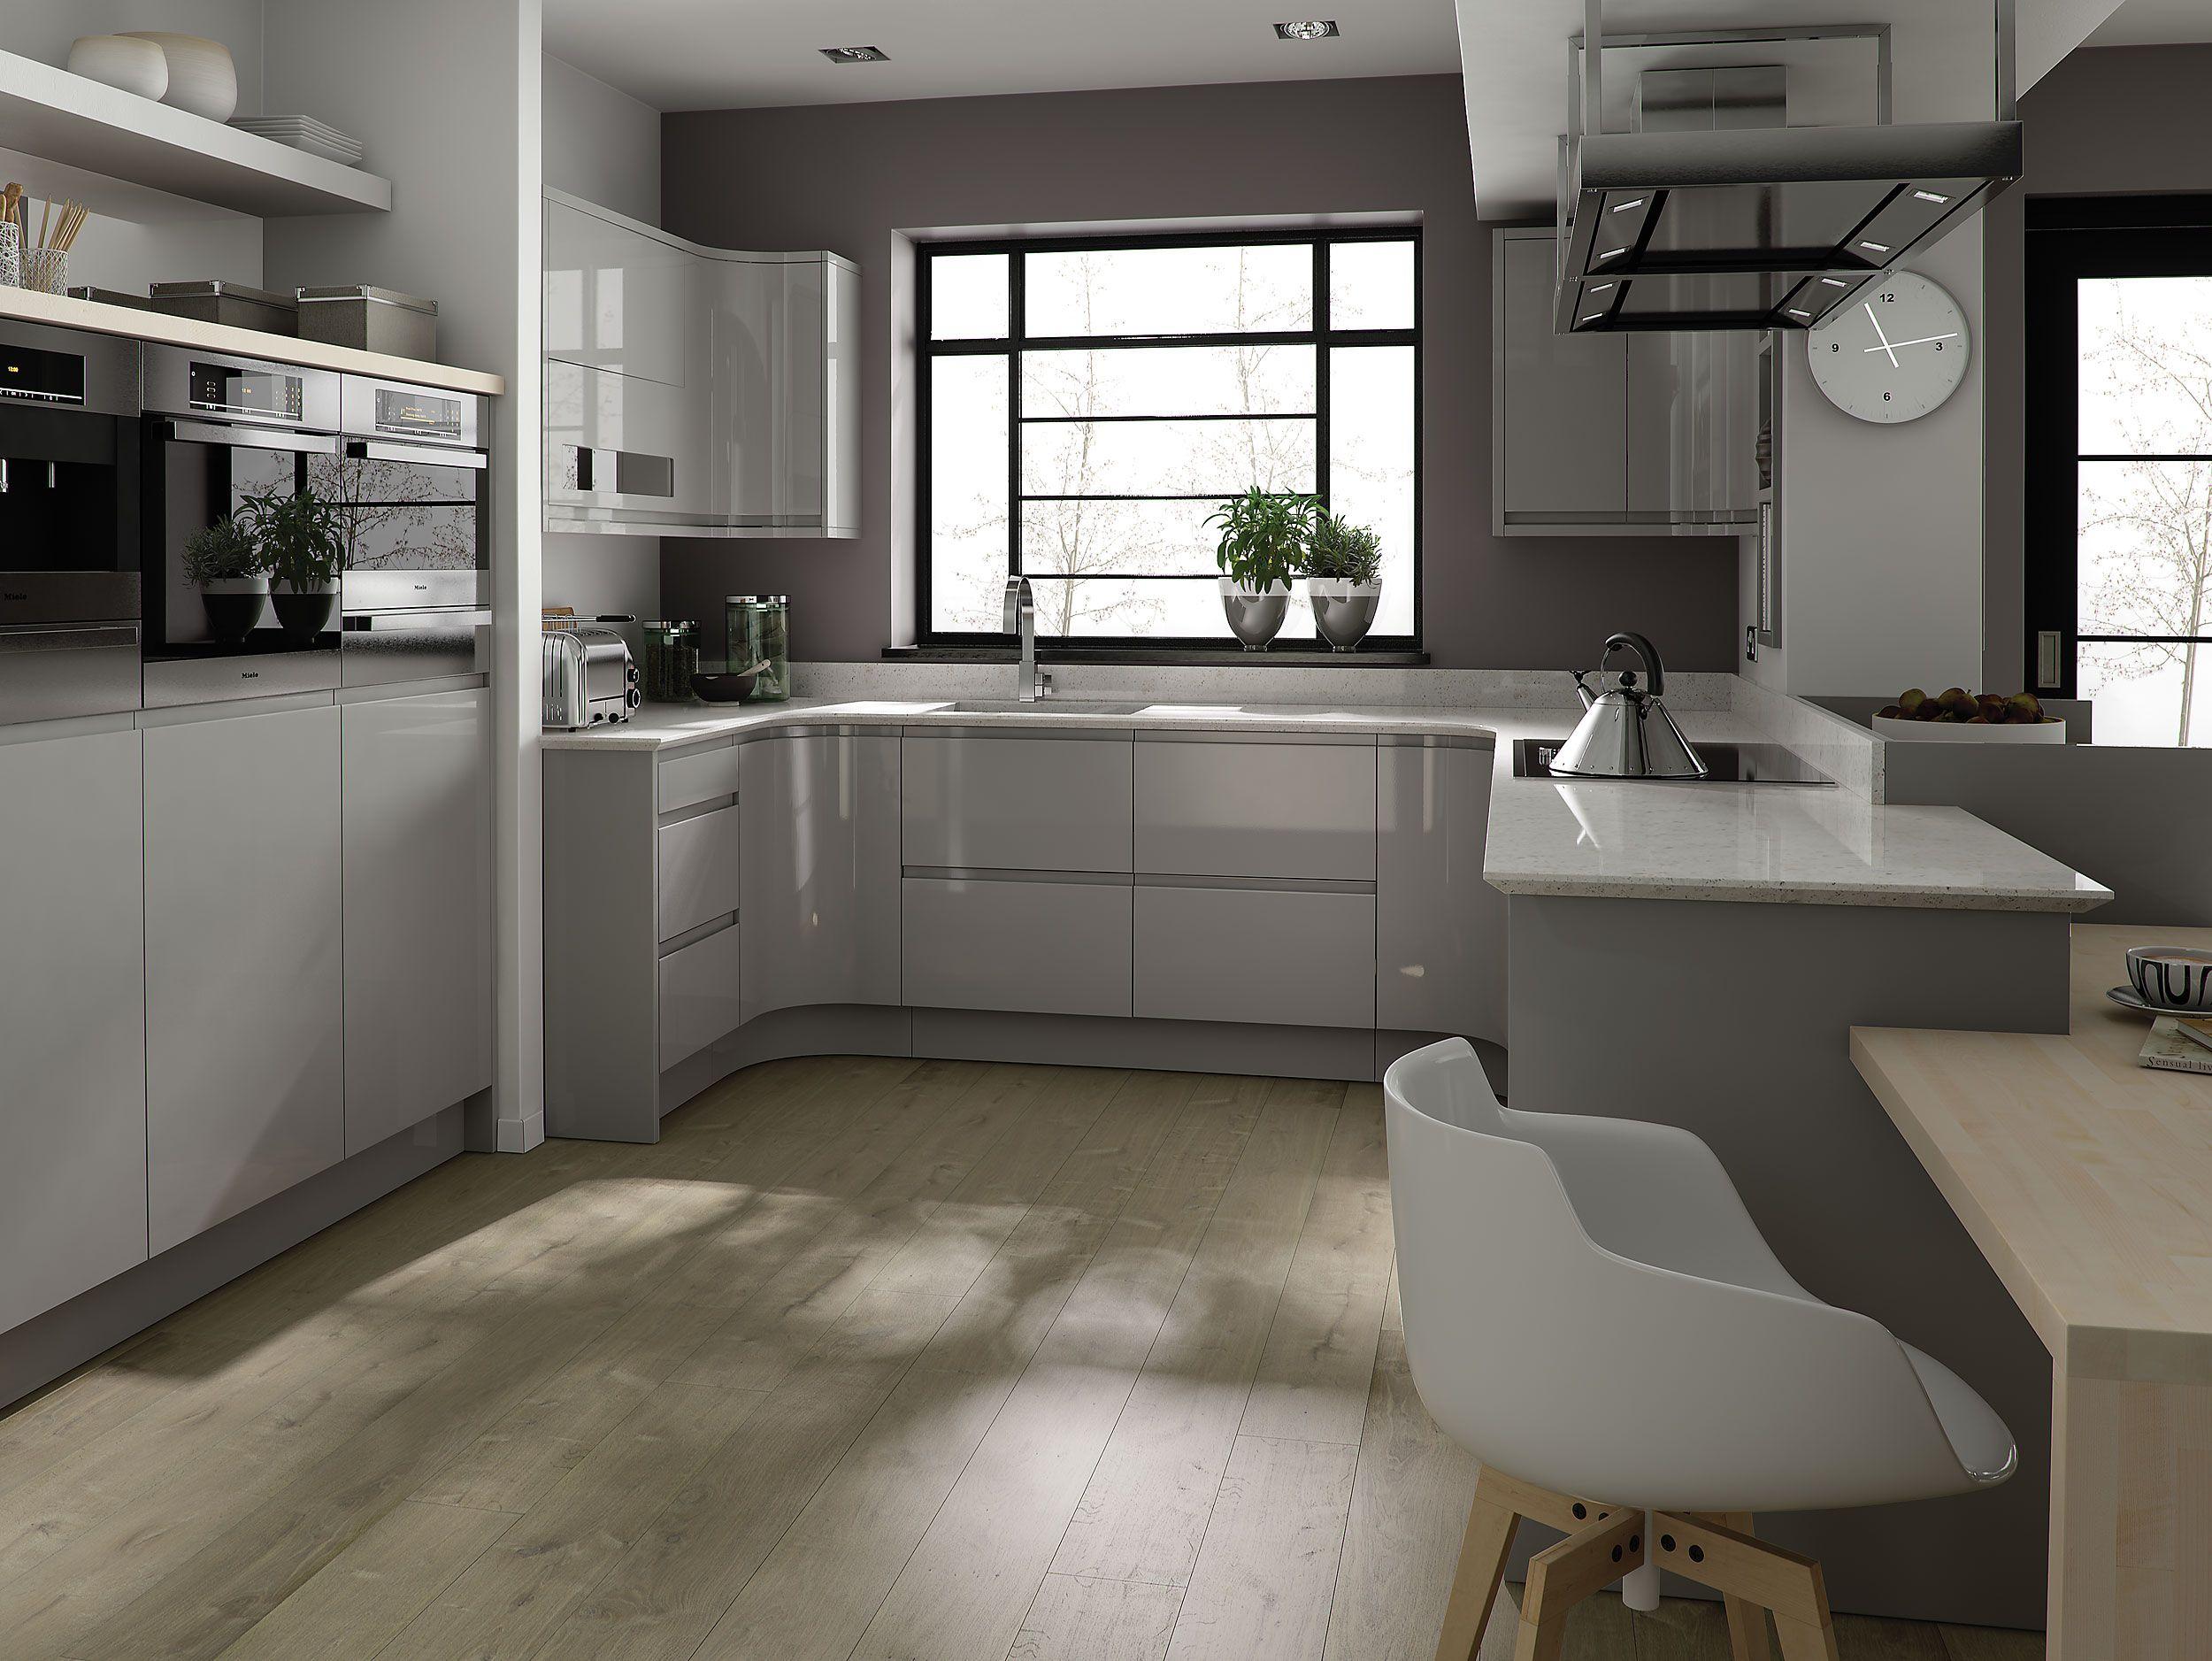 Light Grey Painted Kitchen Cabinets | Kitchens! | Pinterest